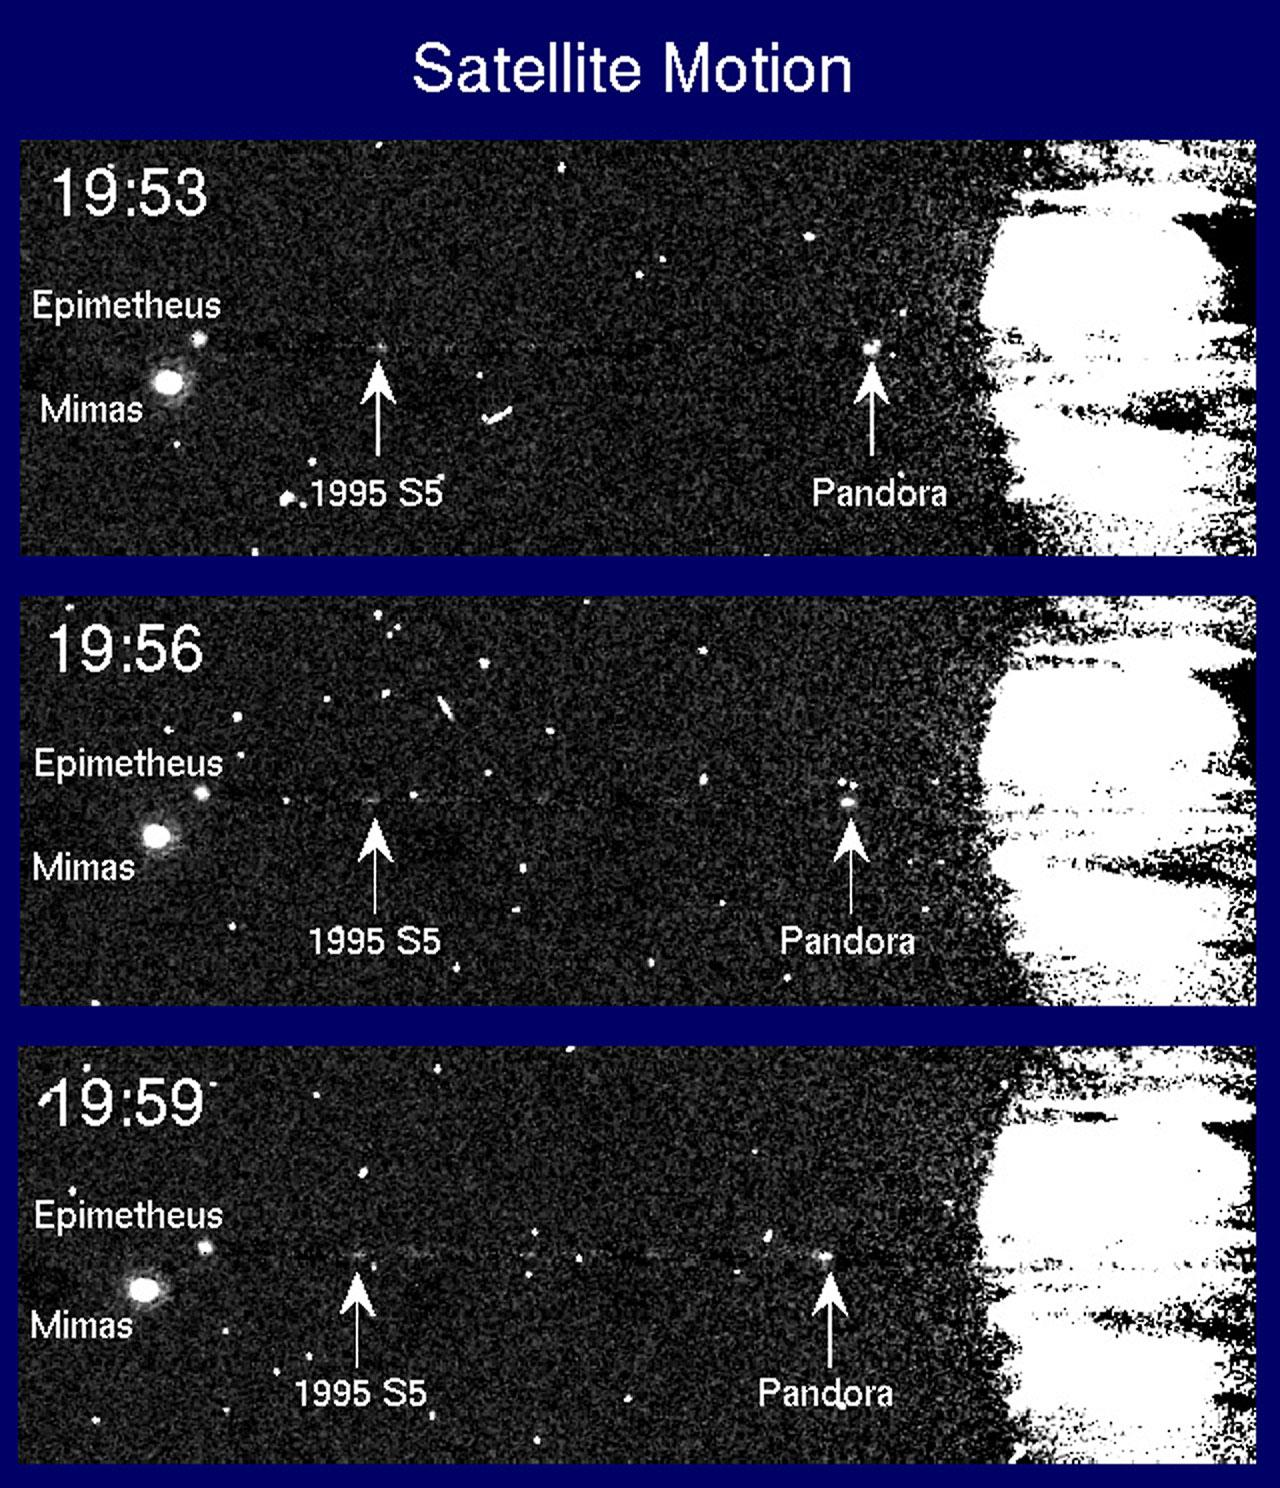 Motion of Saturn's Satellites